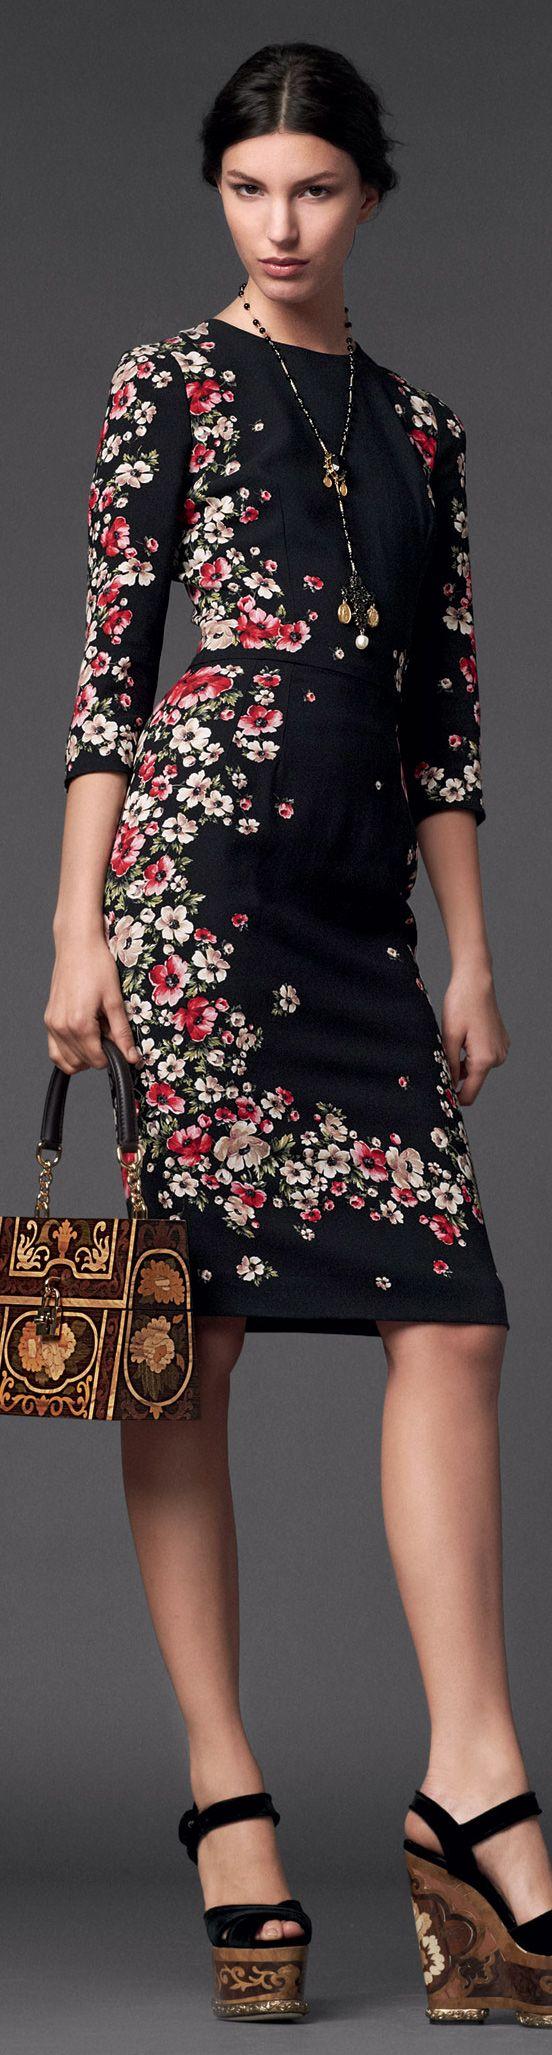 Dolce & Gabbana | Woman Collection W 2014